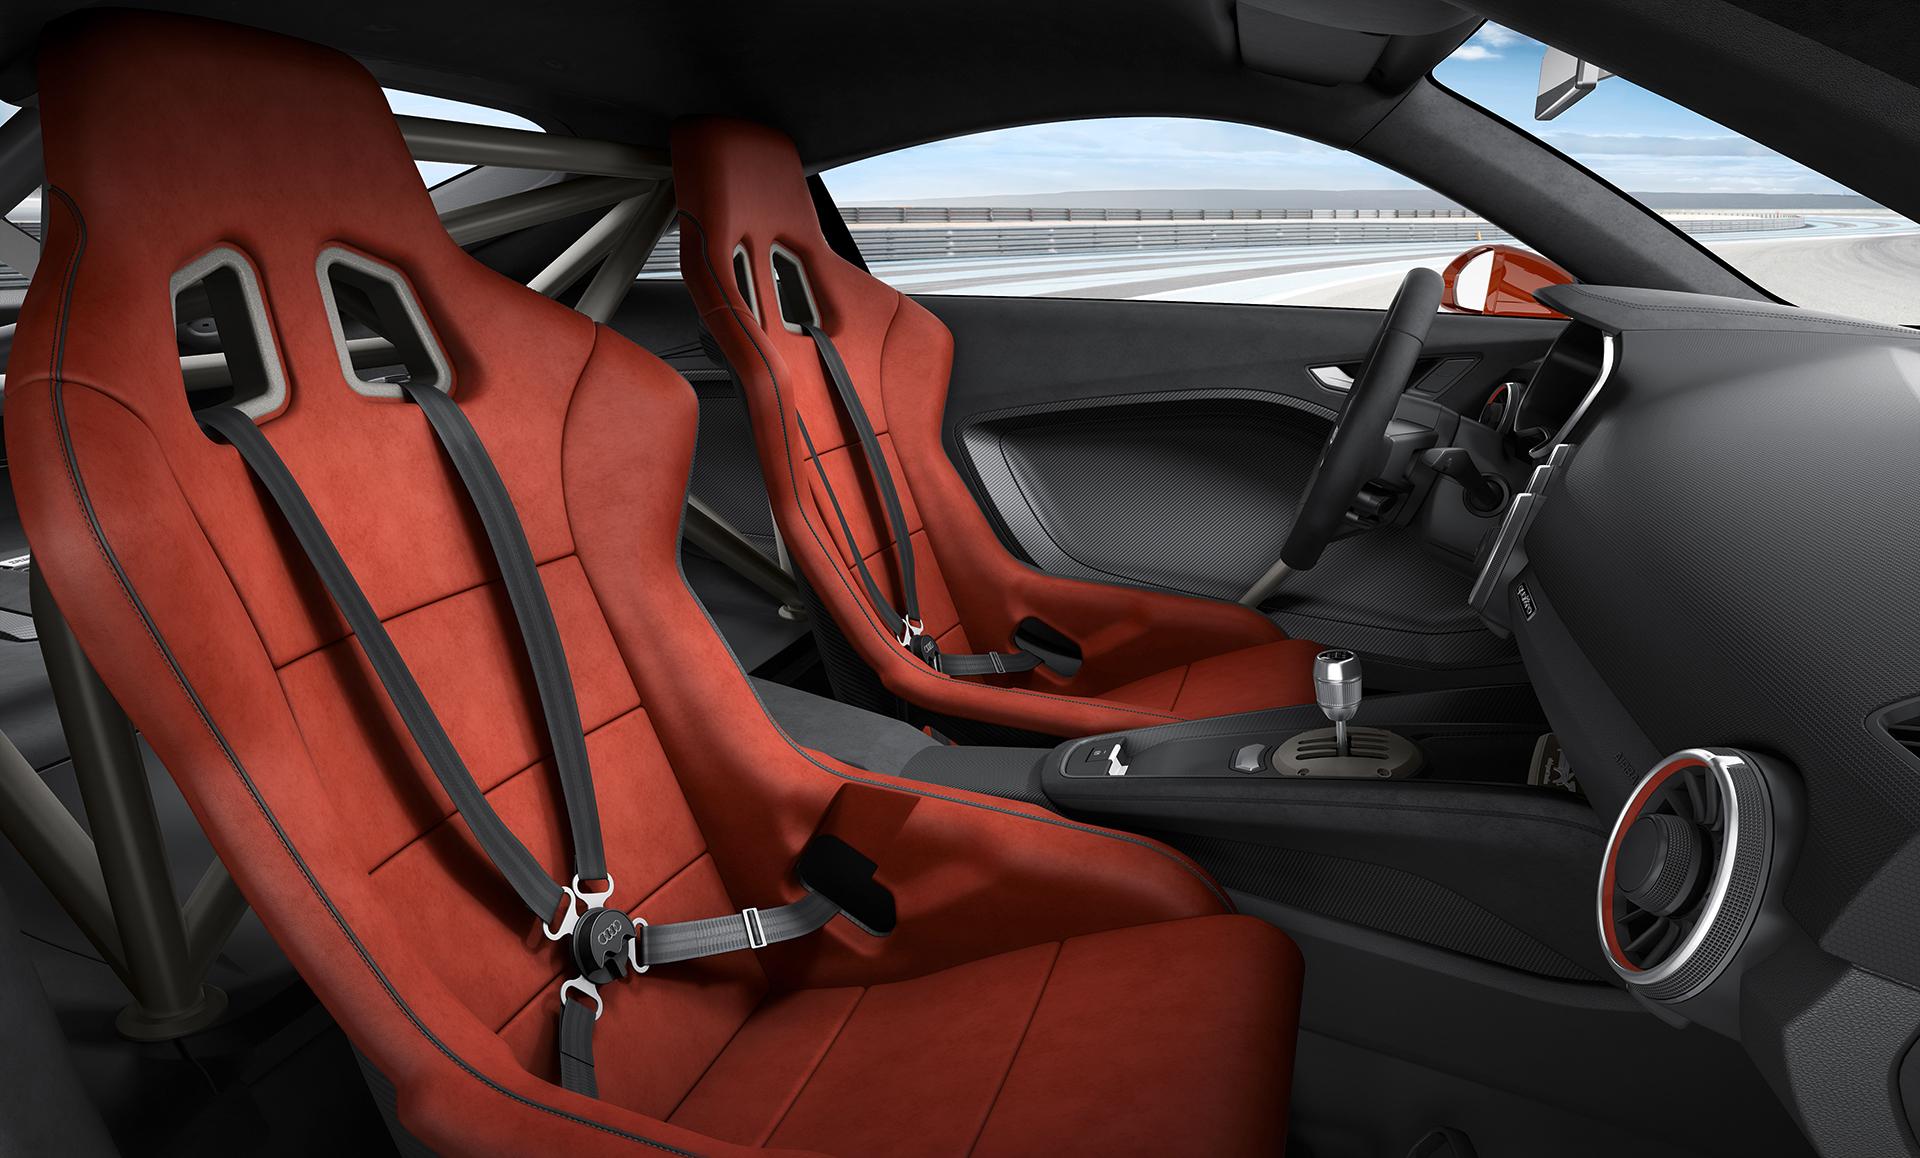 Audi TT clubsport turbo concept - inside / intérieur